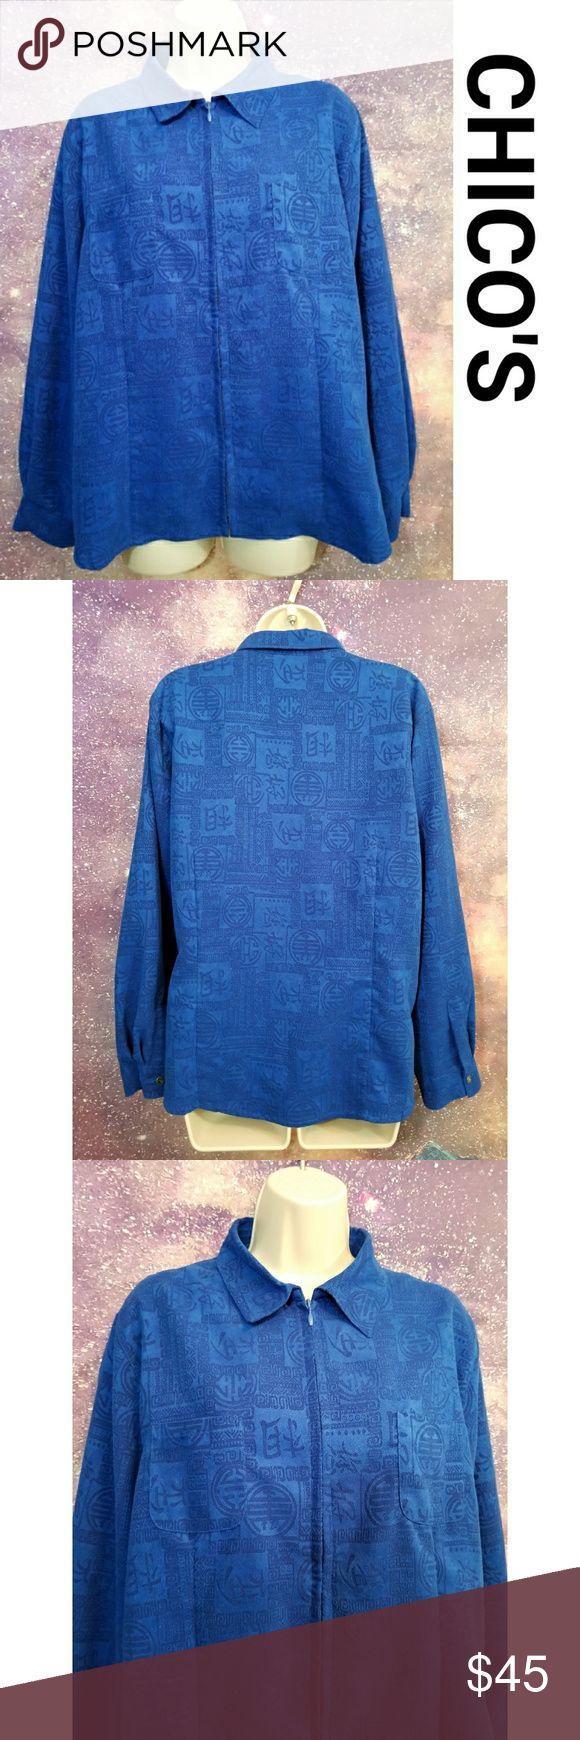 CHICO'S Design Blue Zip Up Jacket Size 2 Chicos Design Zip Up Jacket Chico's Tops Sweatshirts & Hoodies